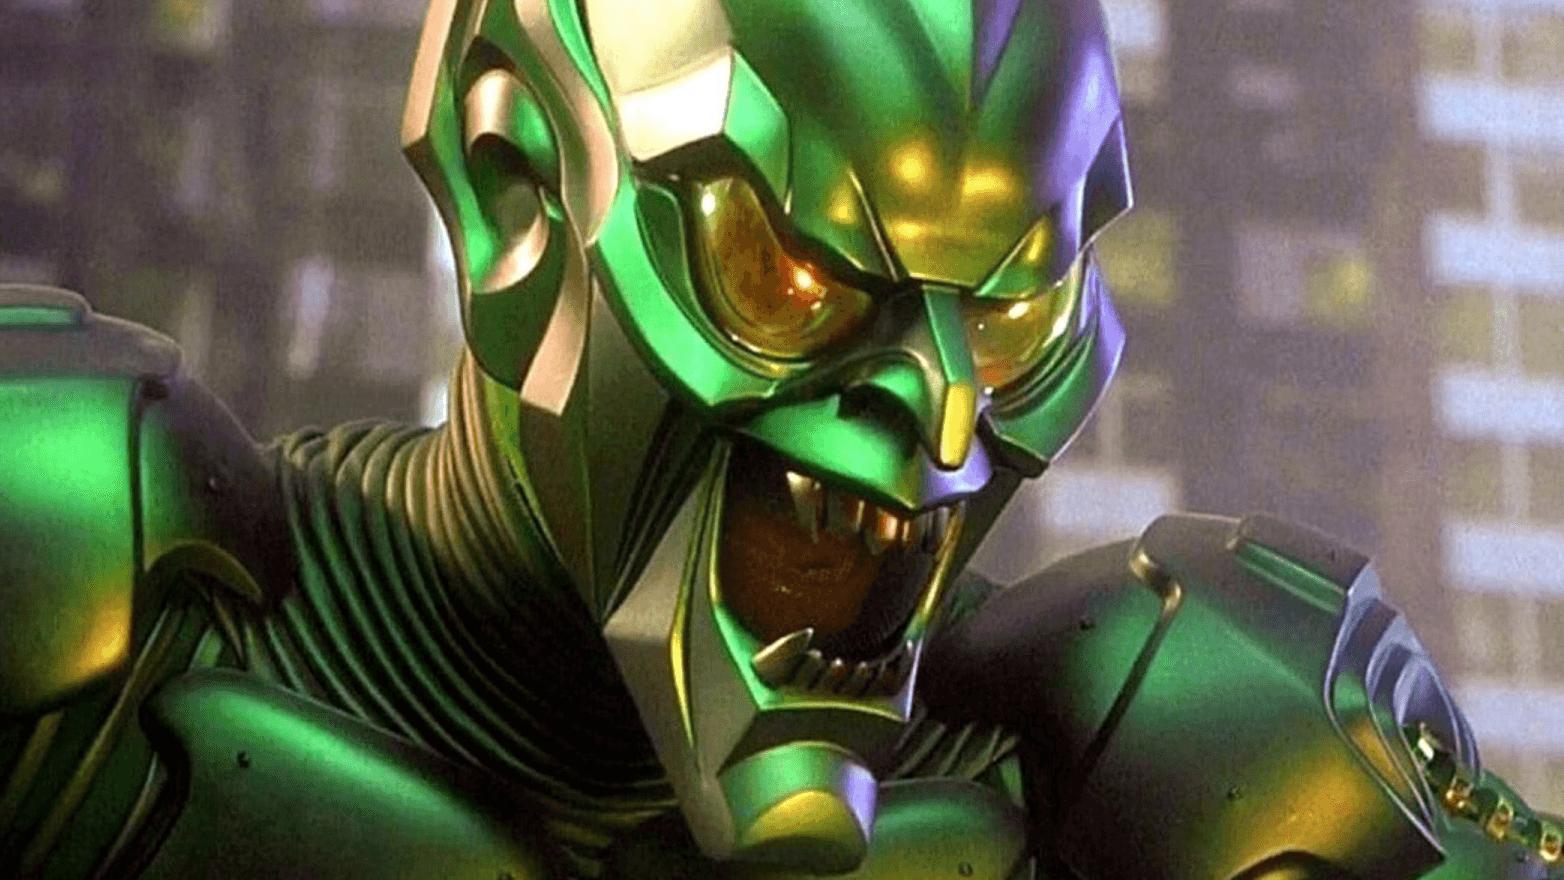 Green Goblin Actors Also Returning In Spider-Man 3